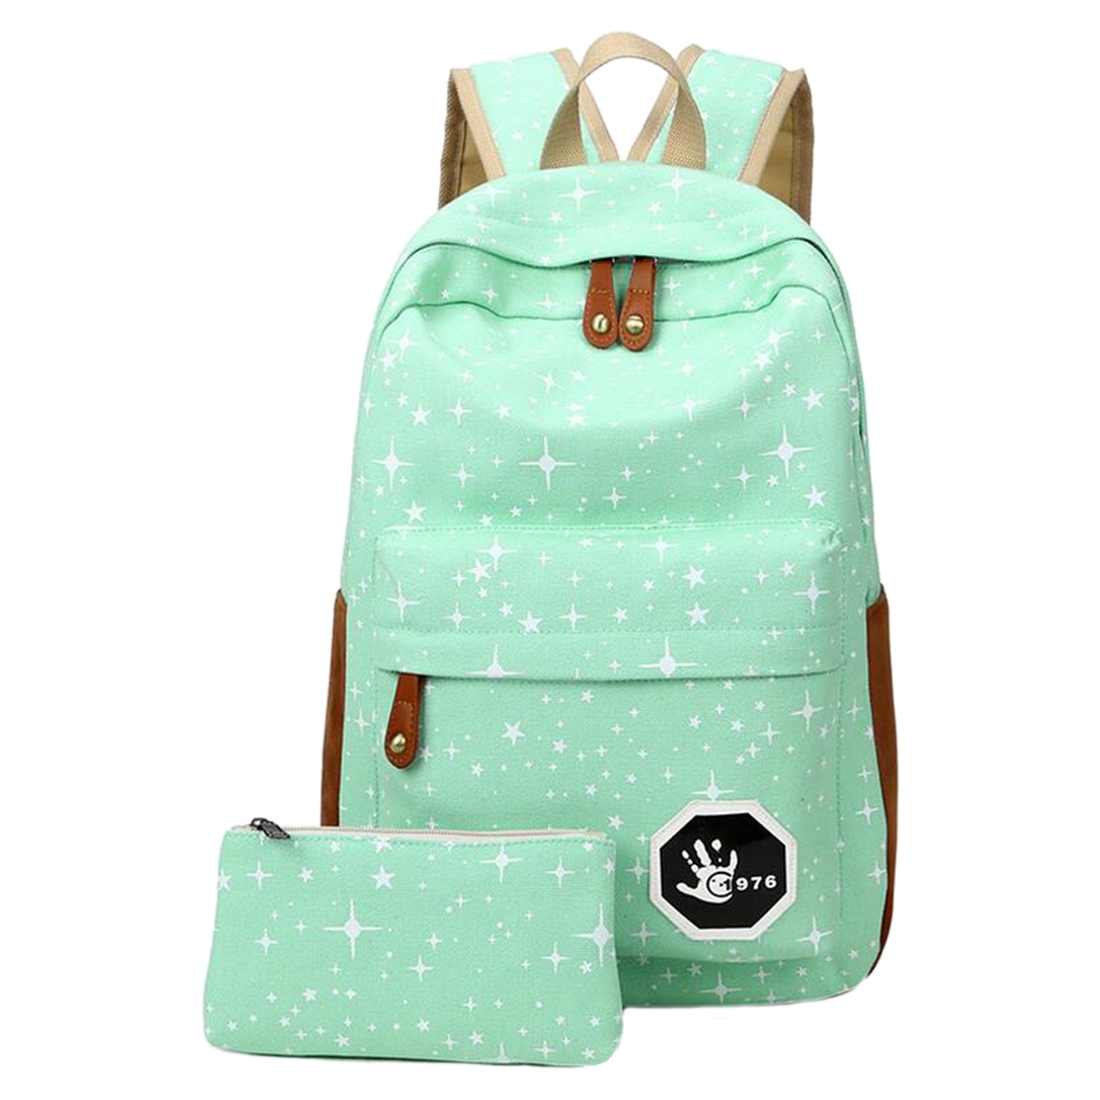 2 Pcs/set Fashion Cute Star Women Men Canvas Printing Backpack School Bag For Girl Boy Teenagers Casual Travel Bag Rucksack #4